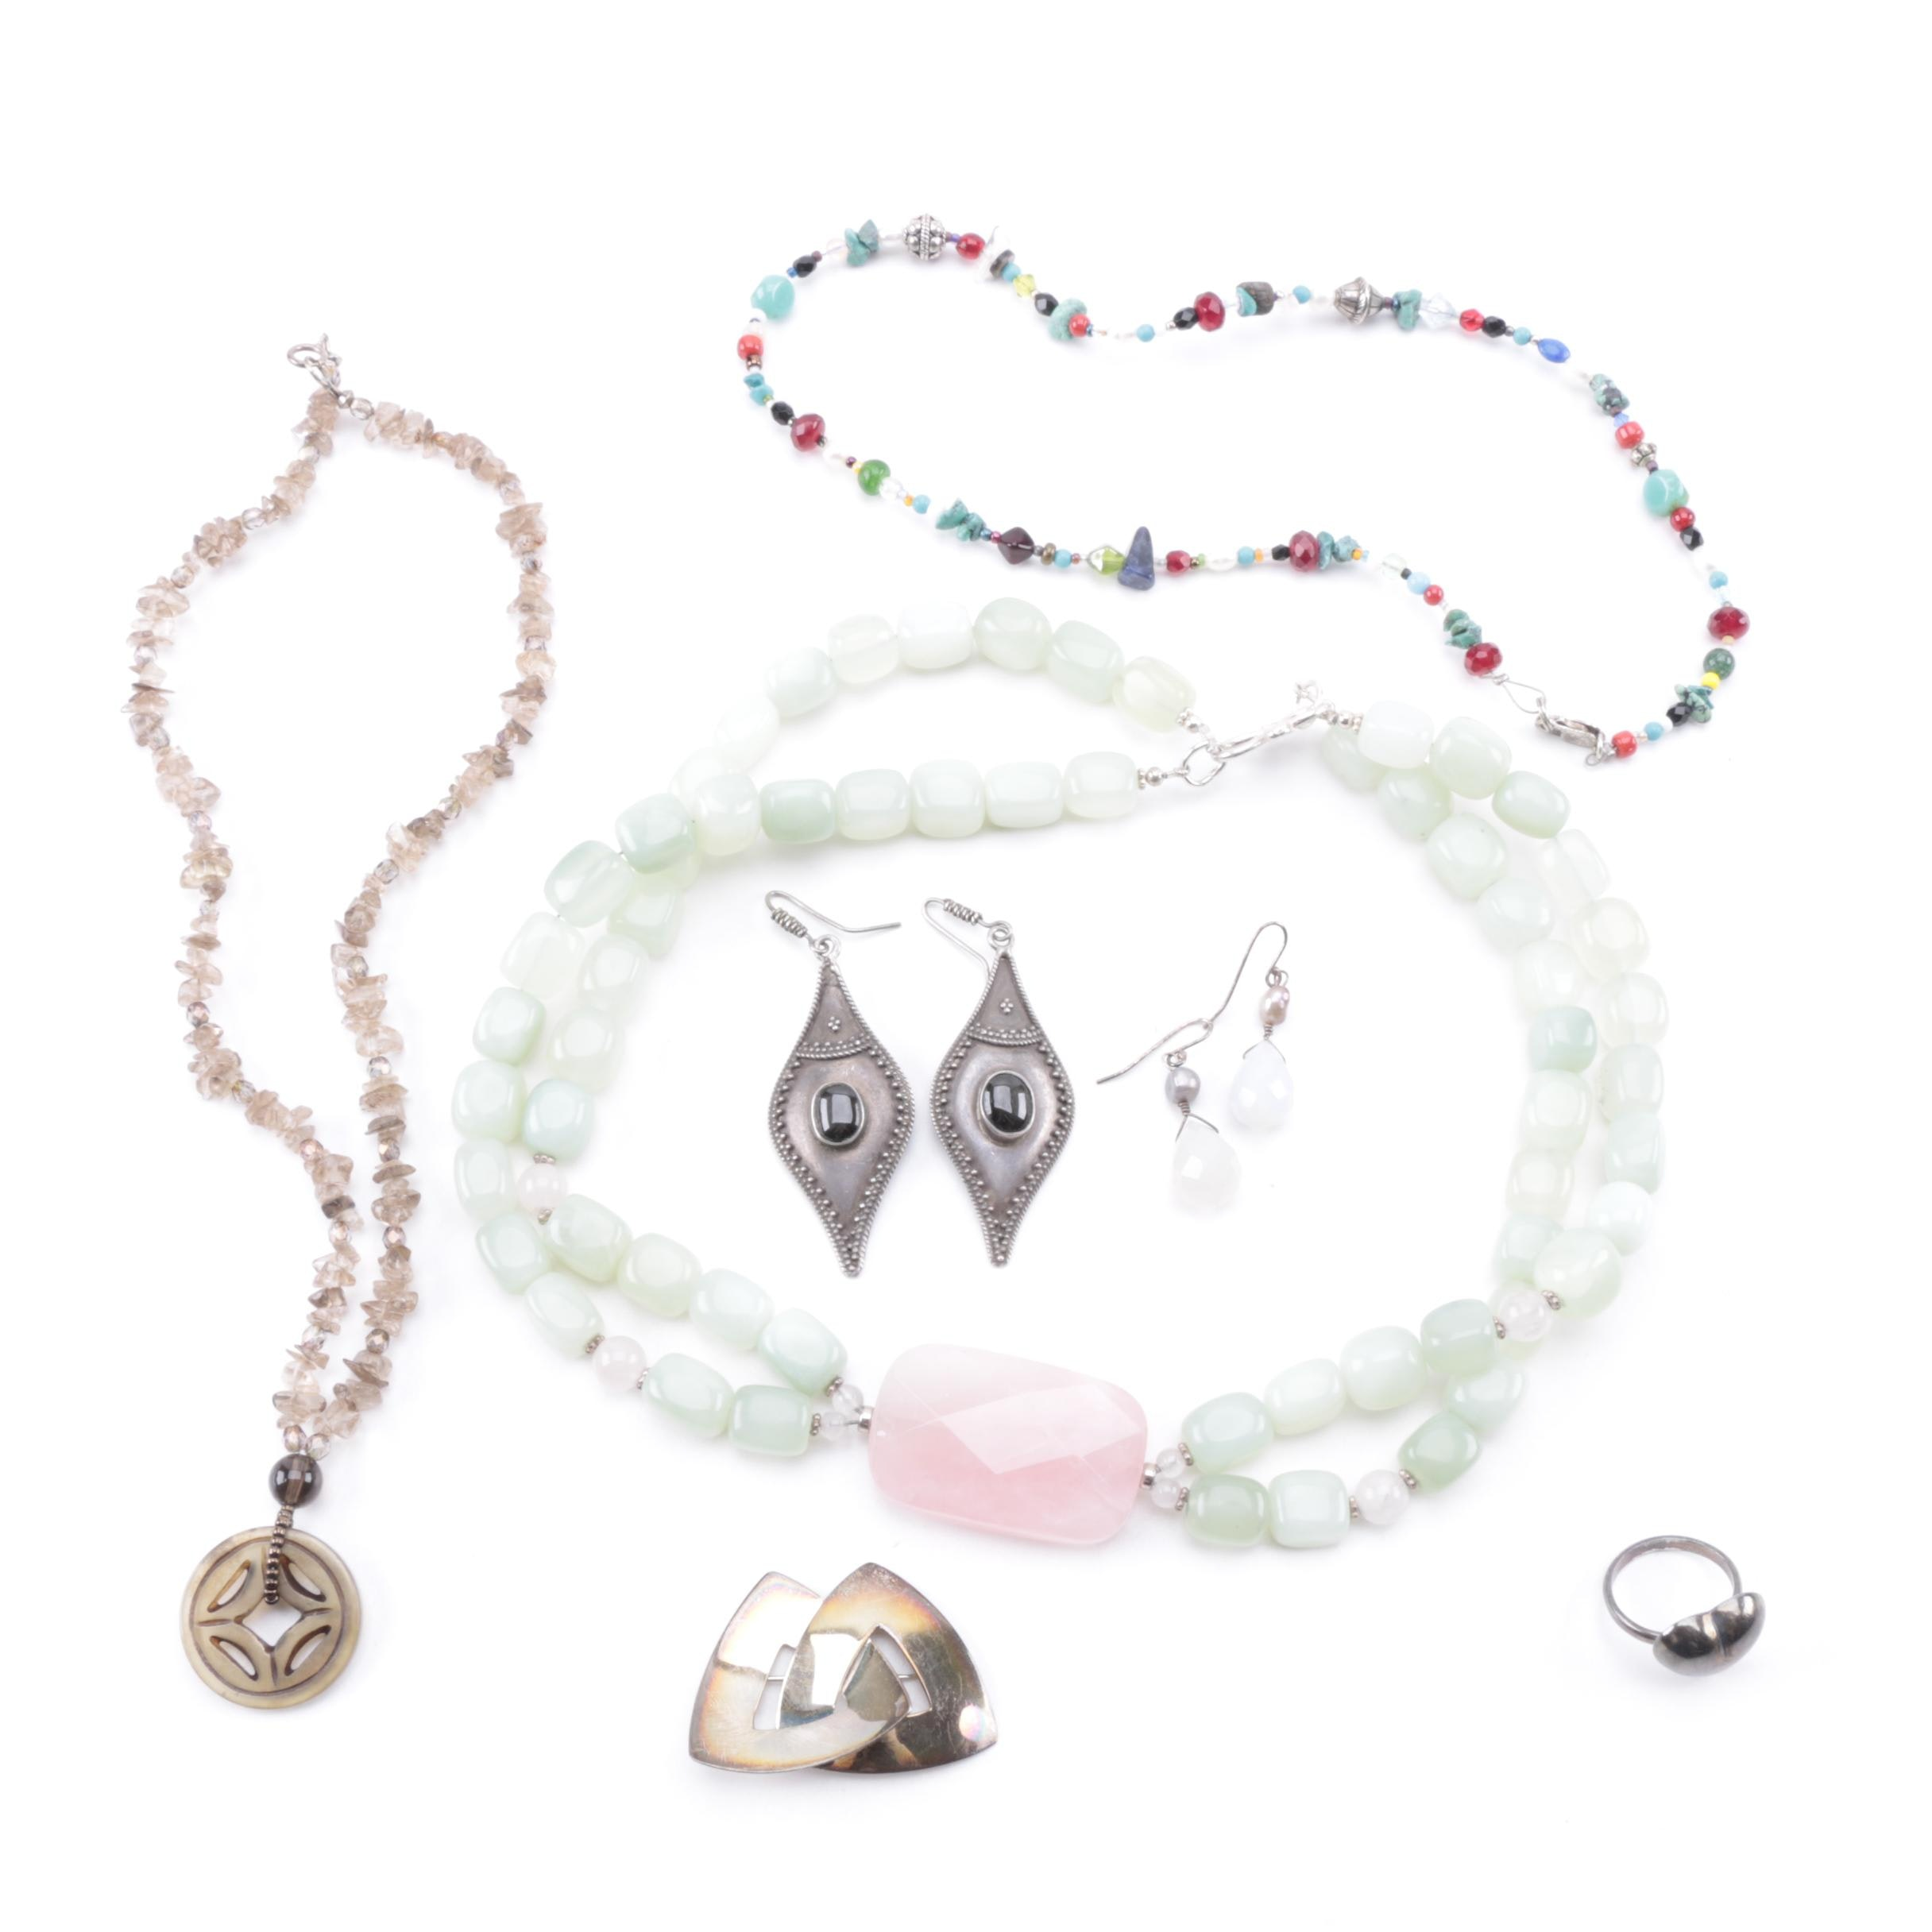 Sterling Silver Jewelry Featuring Rose Quartz, Smoky Quartz and Bowenite